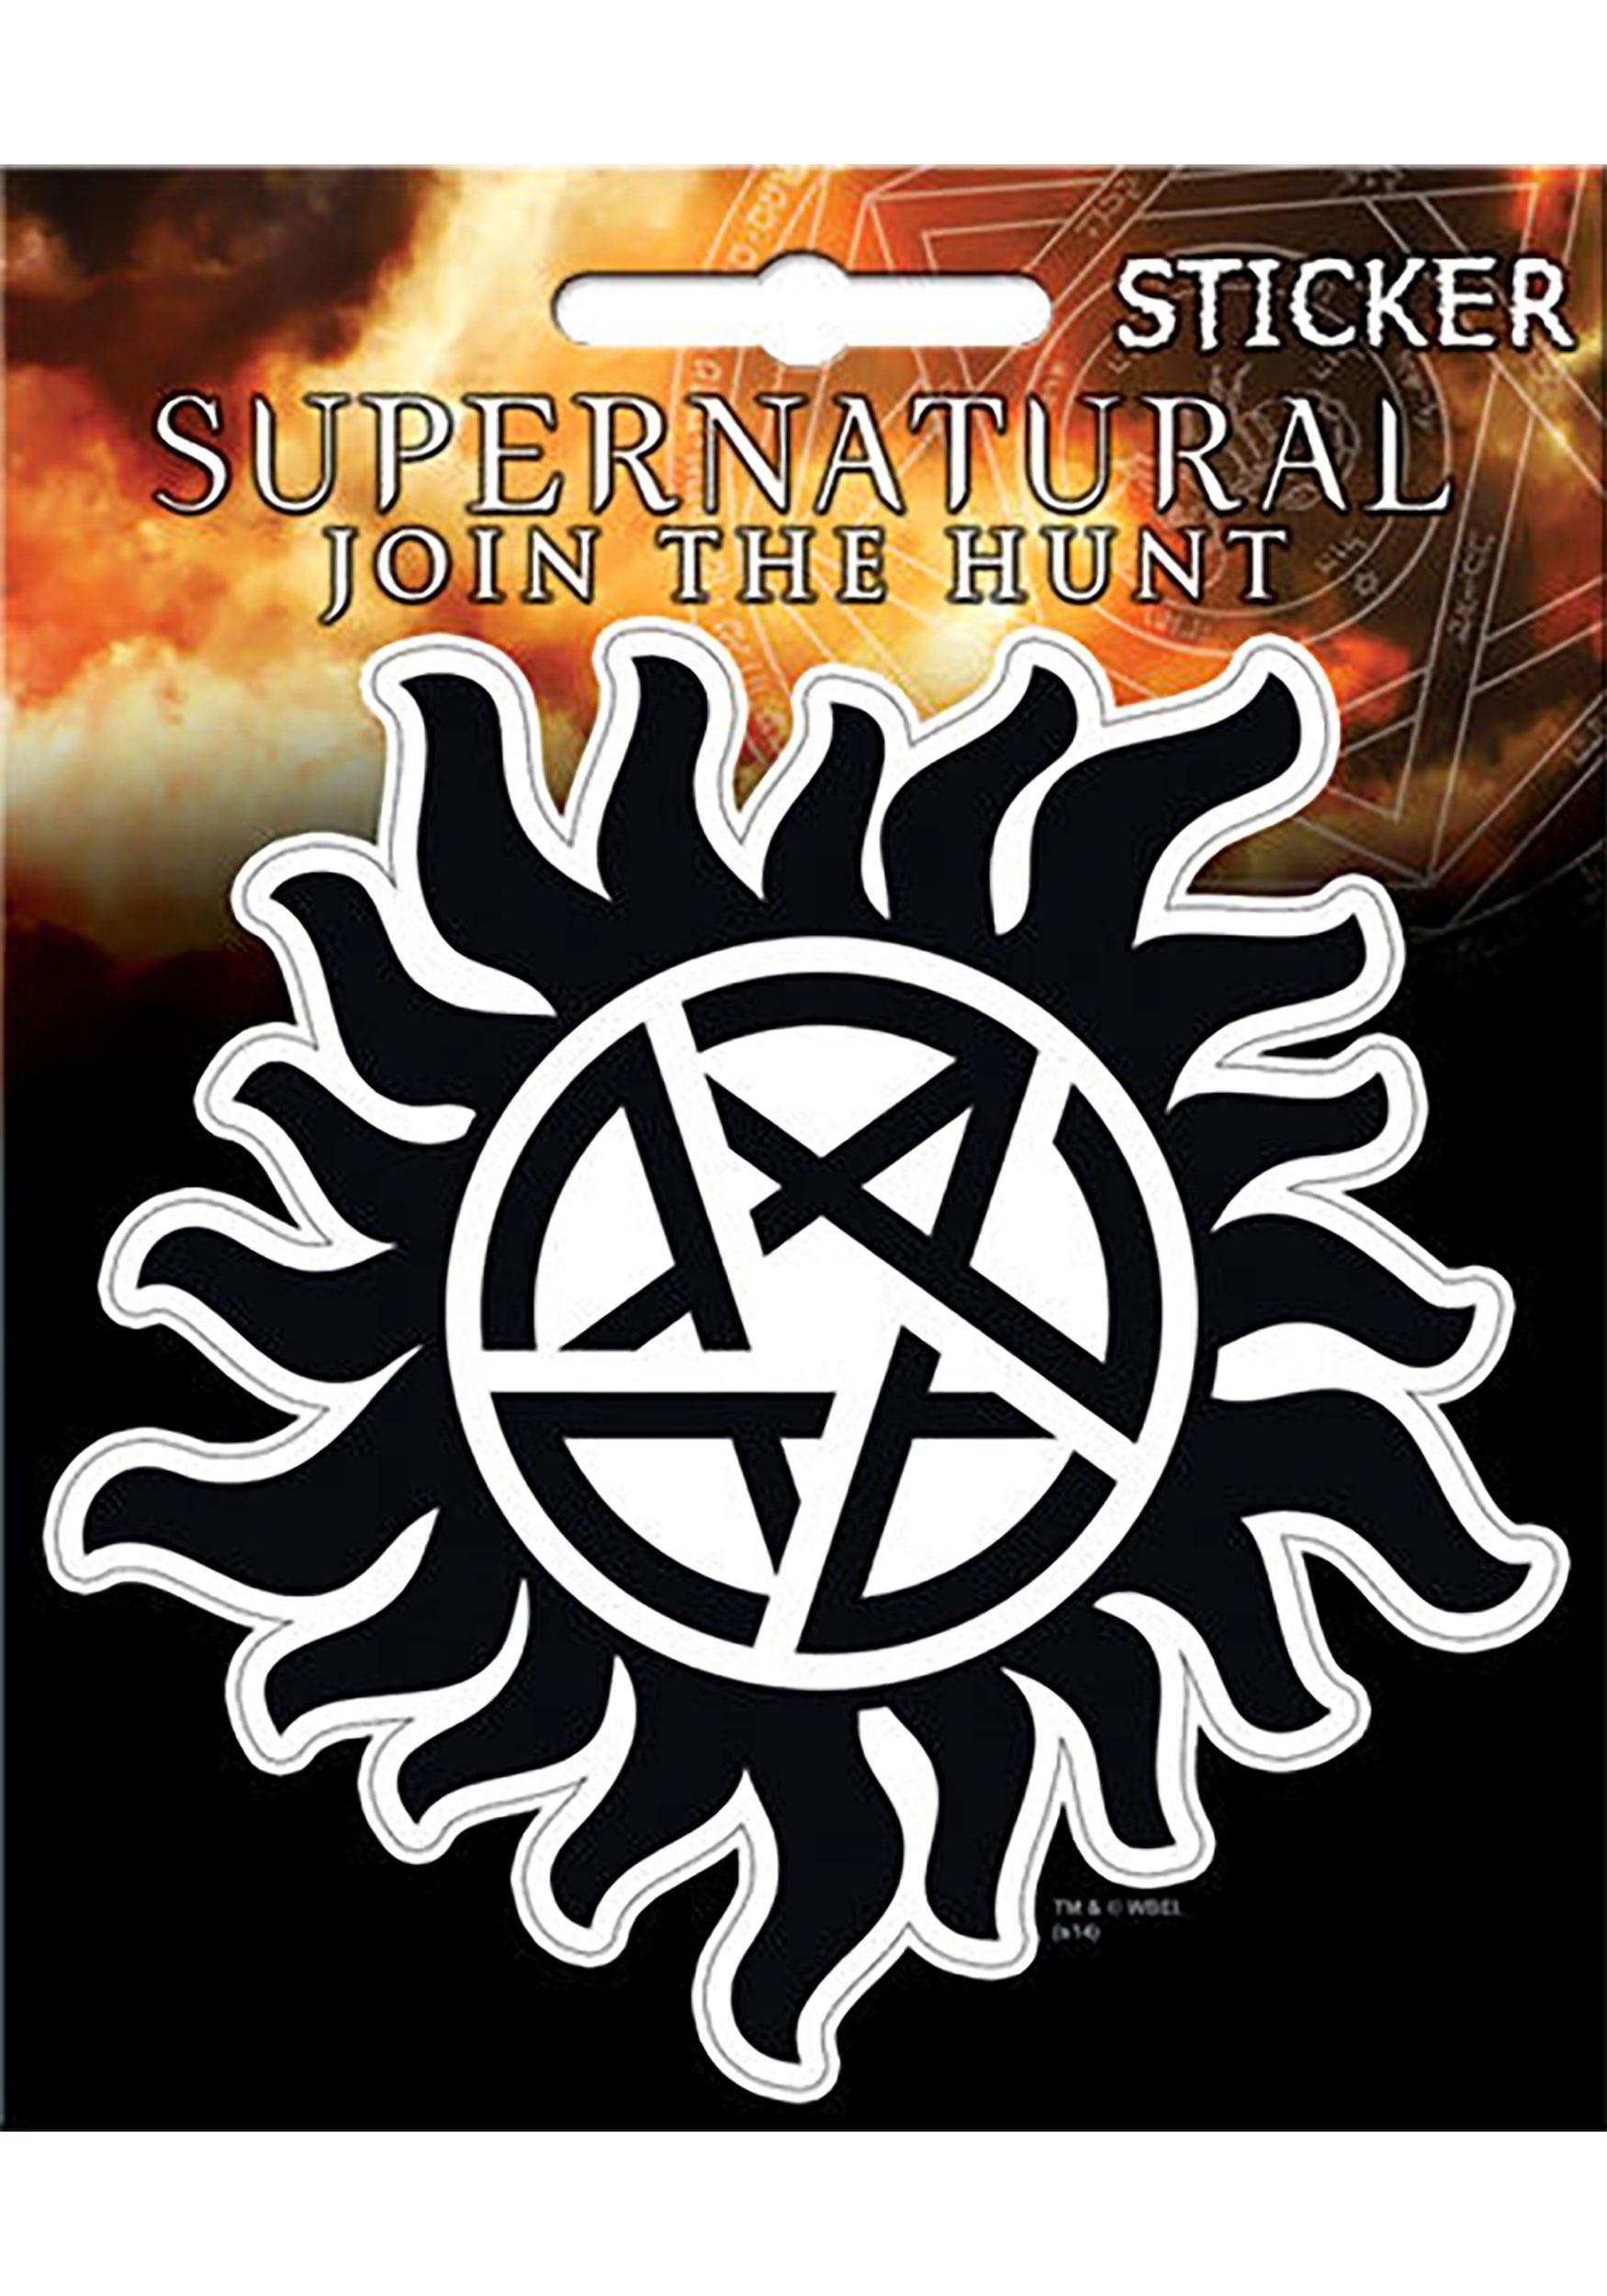 Supernatural_Sticker